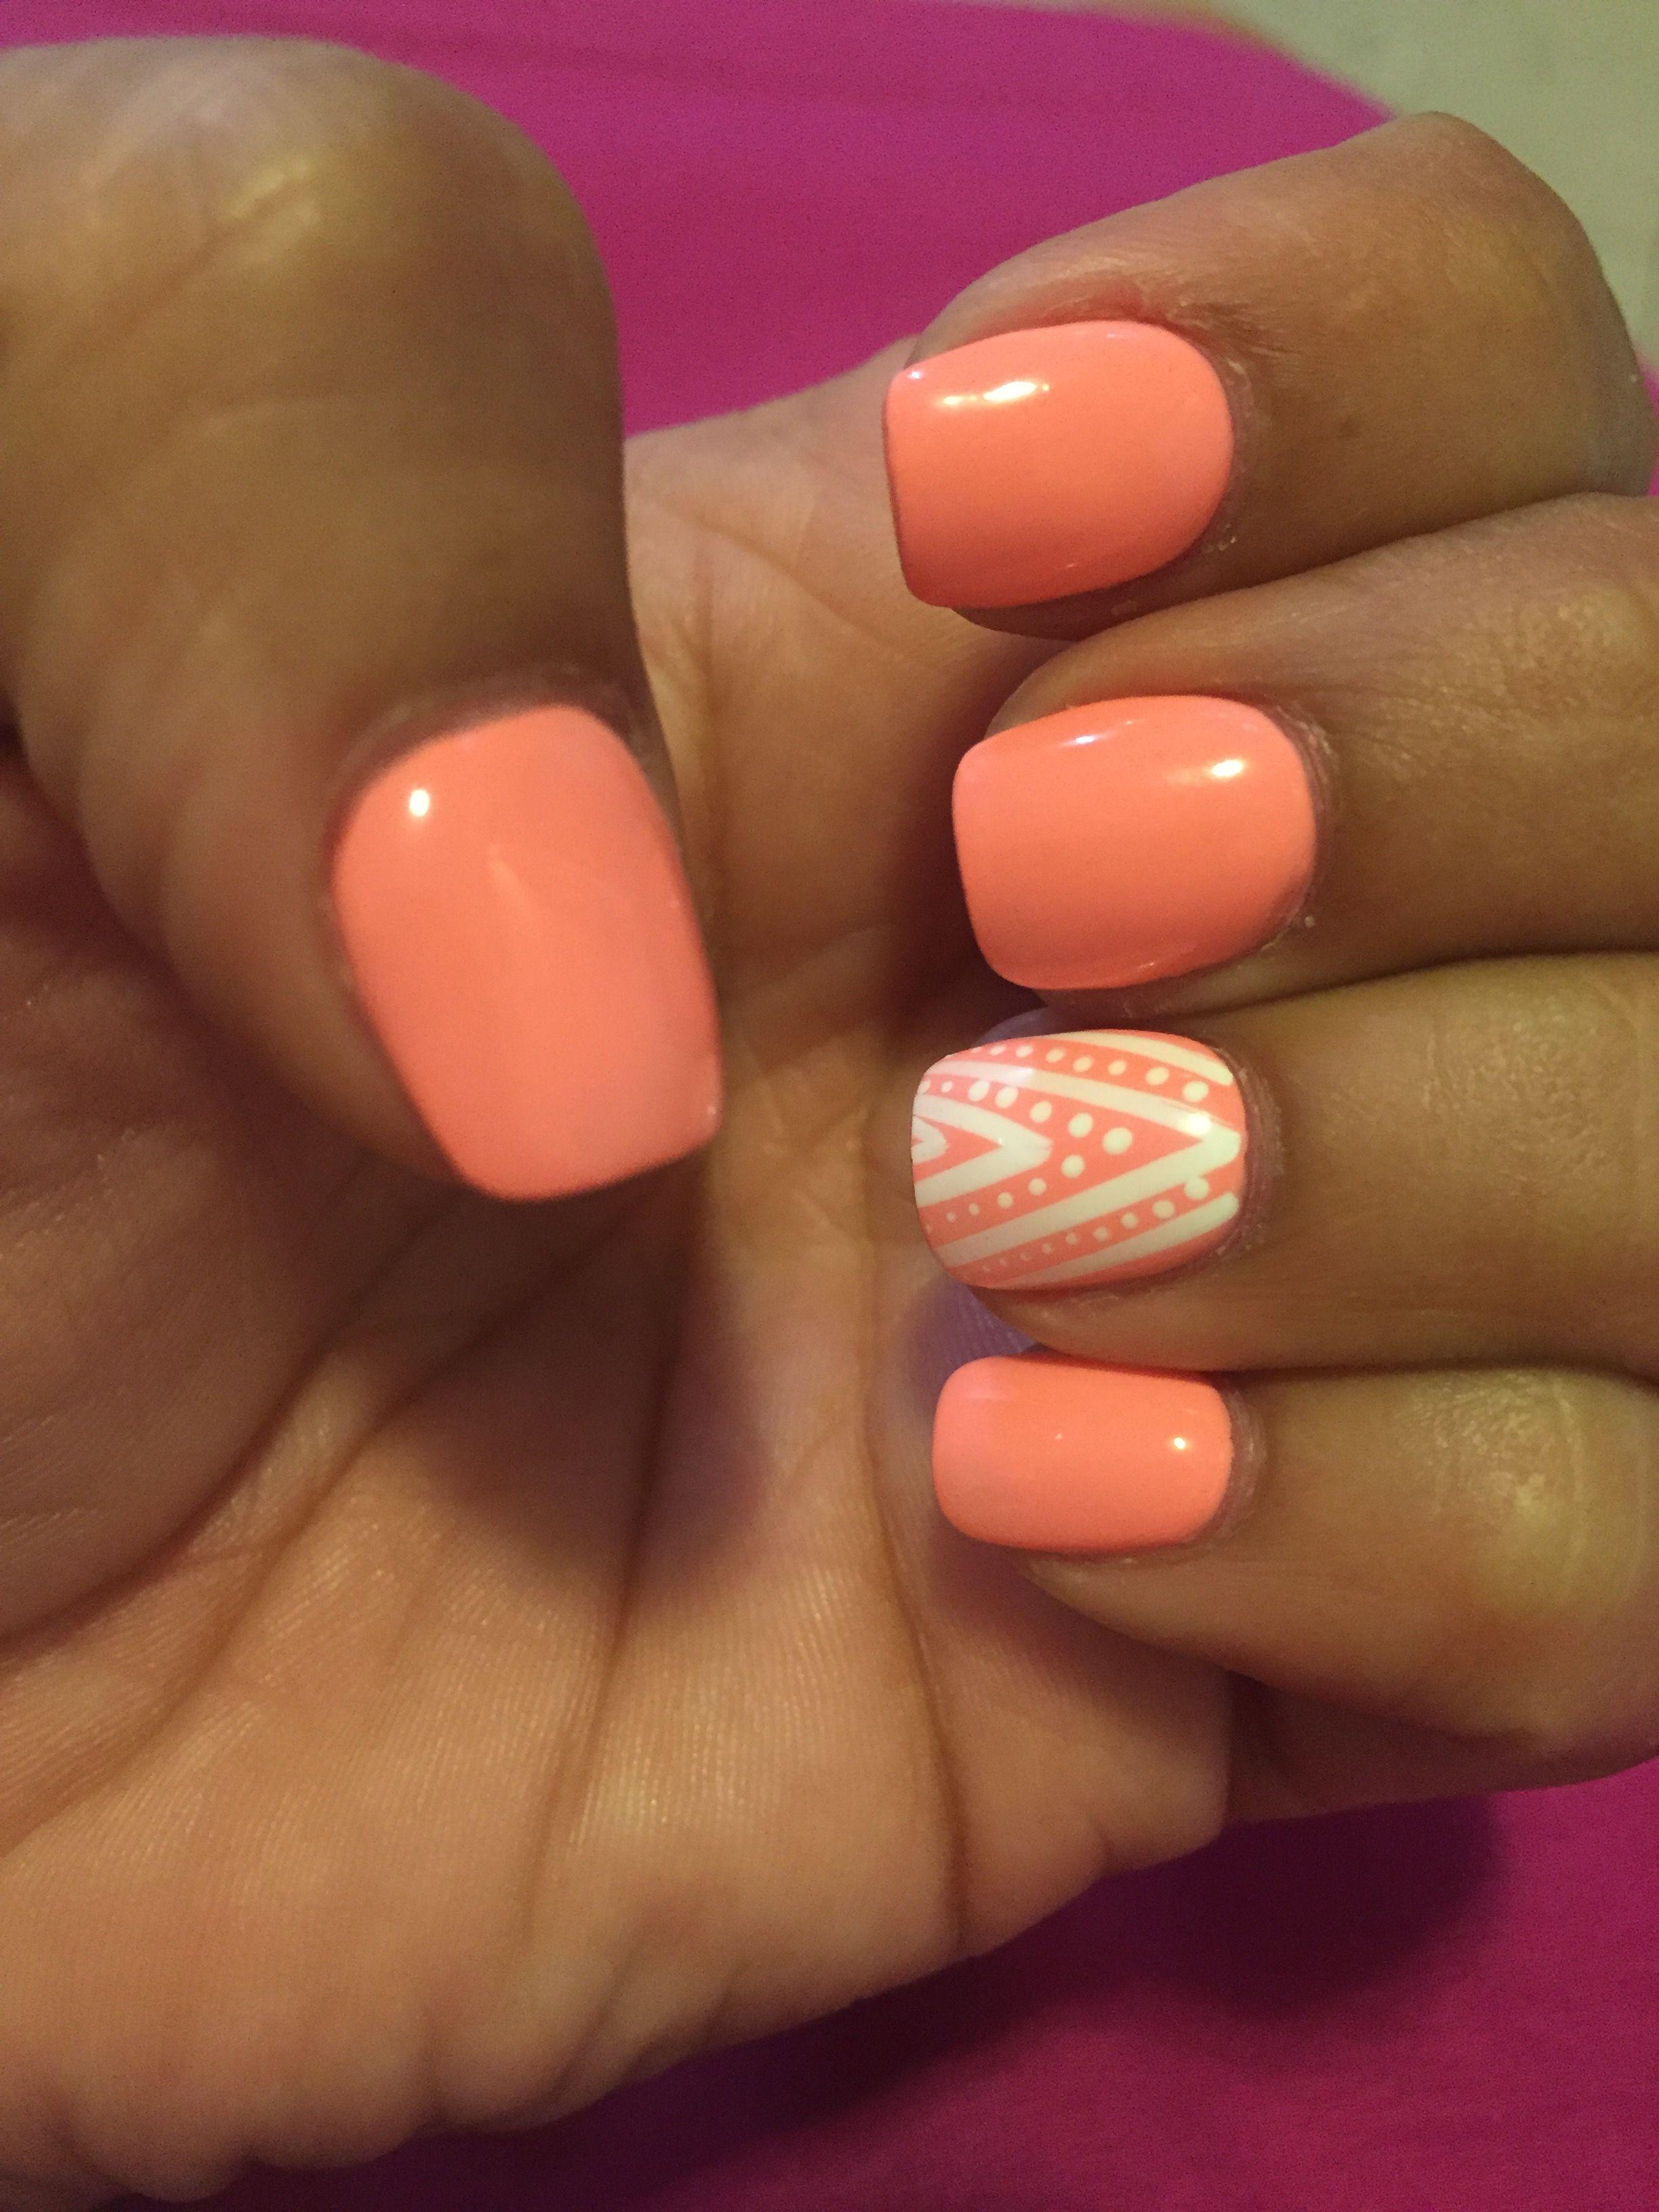 Coral Peach White Lines Dots Nail Design Coral Acrylic Nails Nails Acrylic Nail Designs